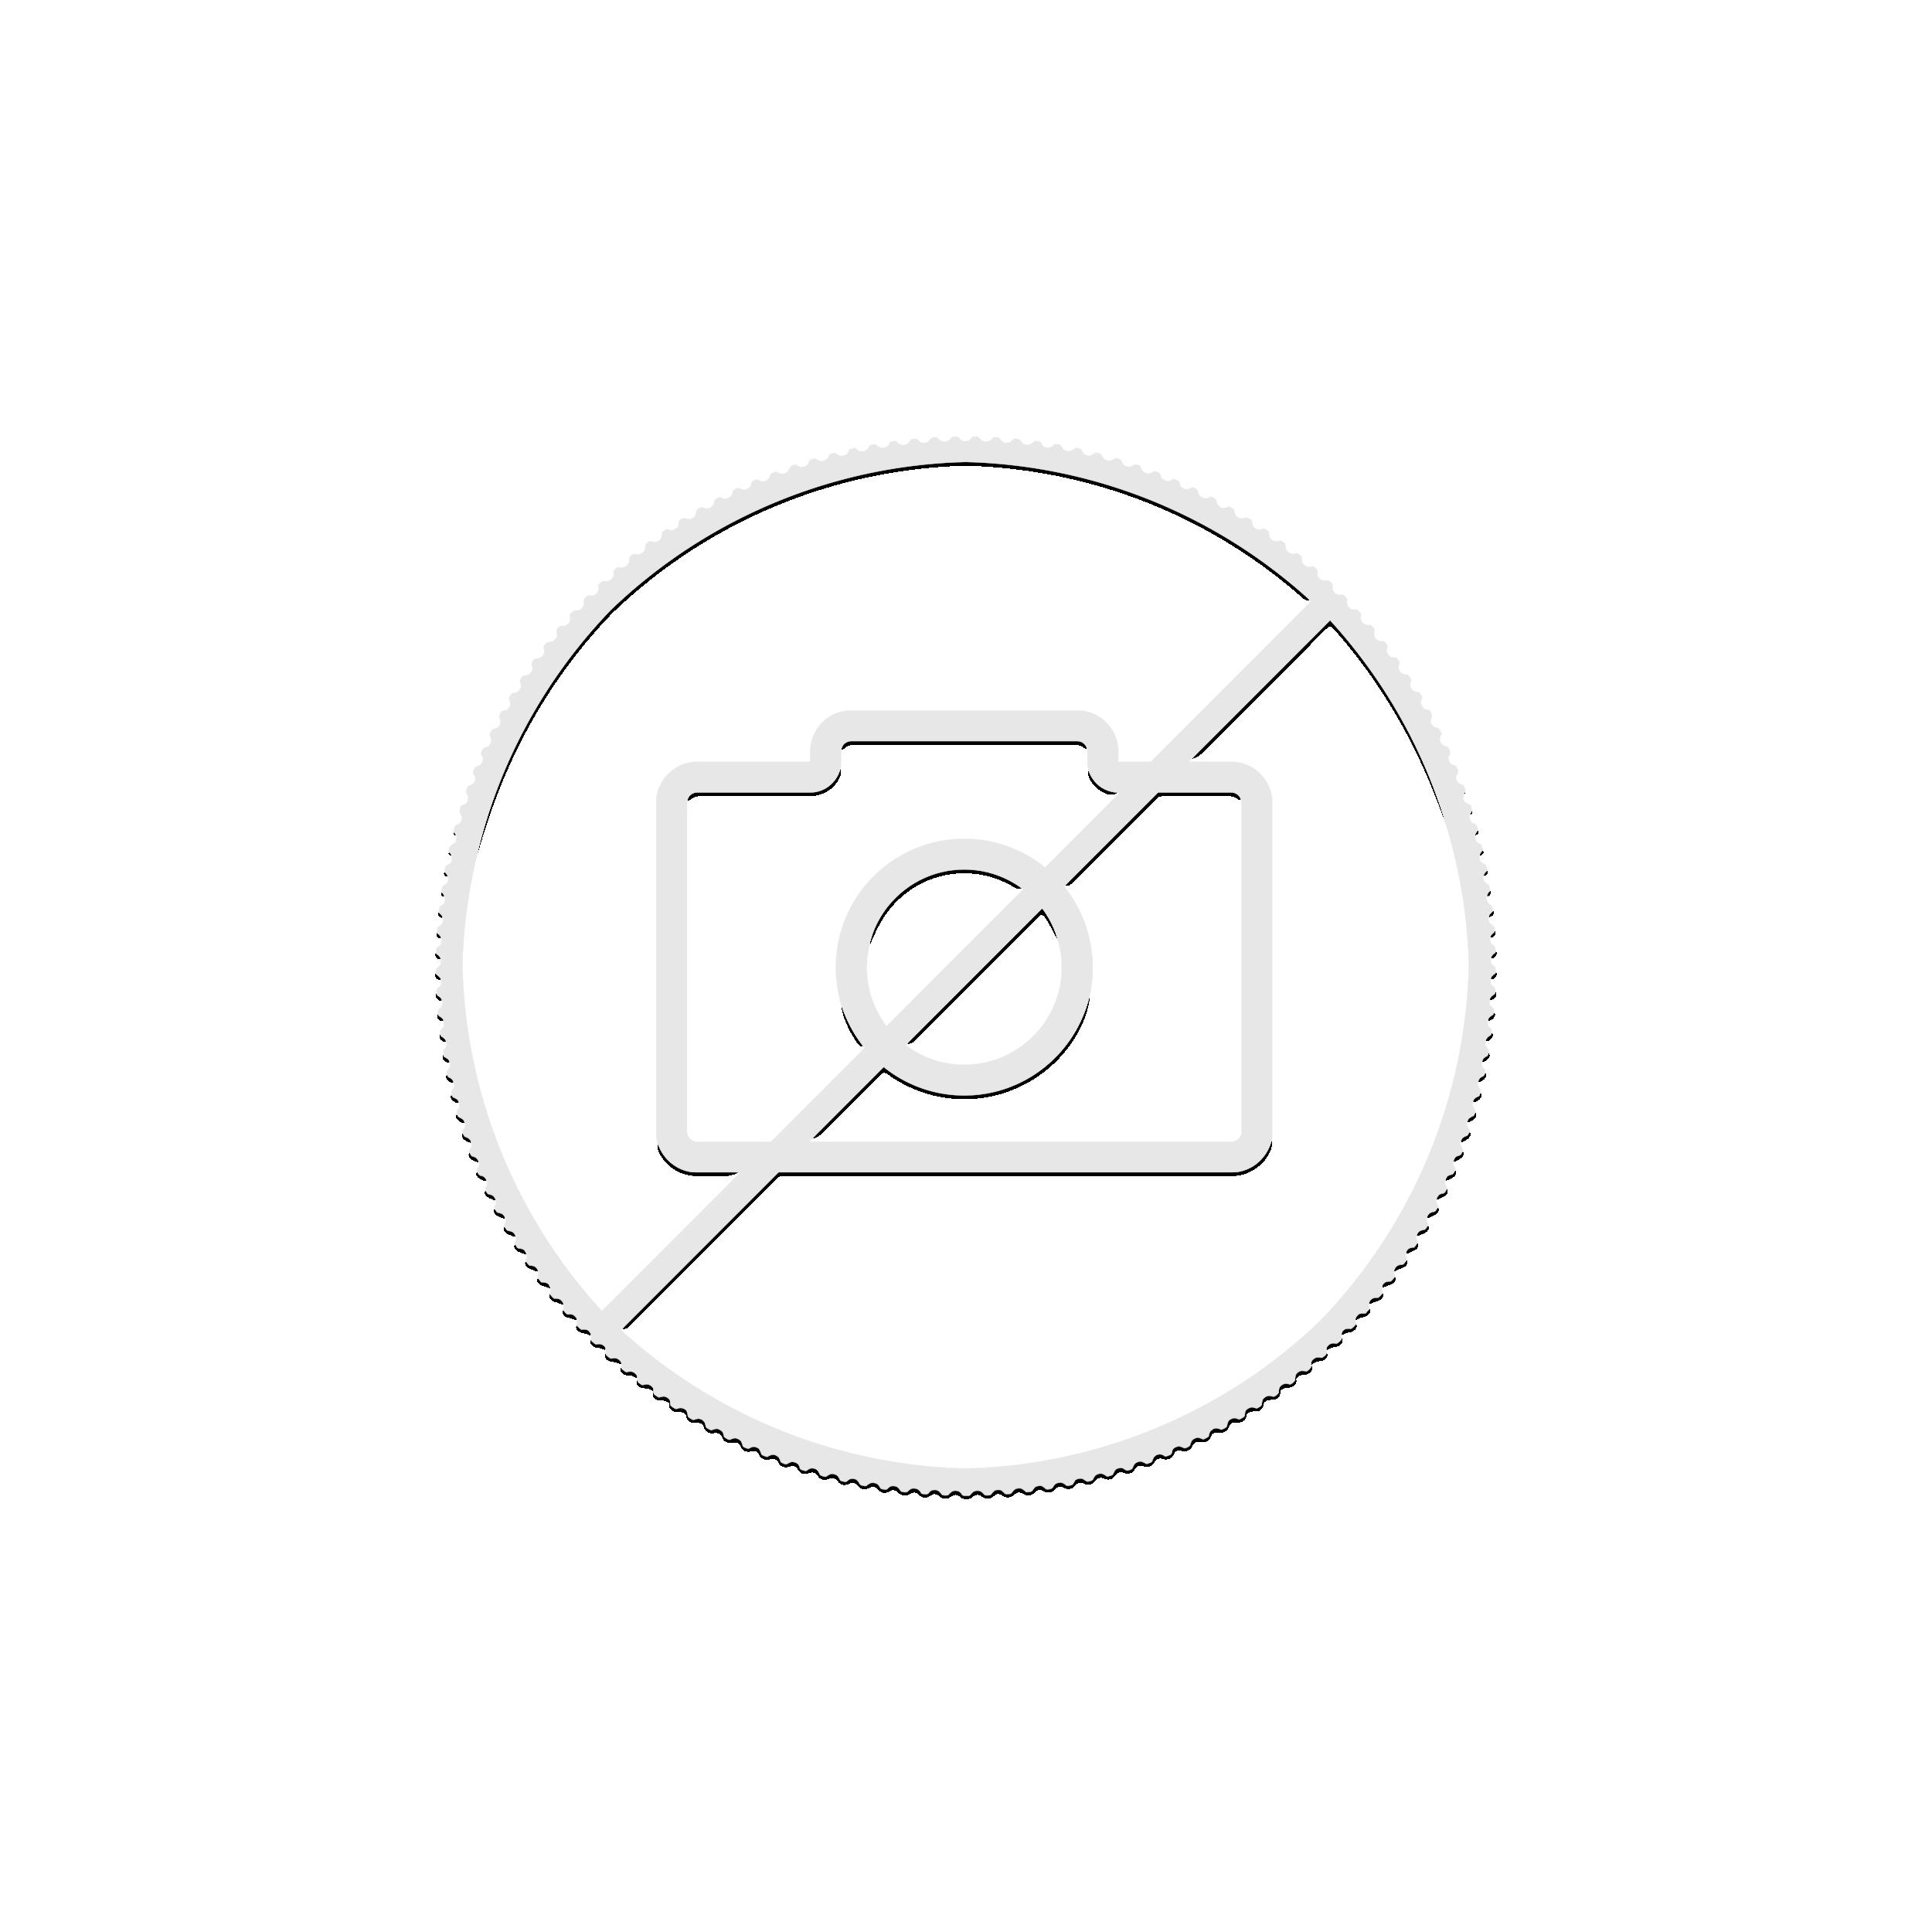 1 Troy ounce silver coin Golden Ring - Silver Eagle 2019